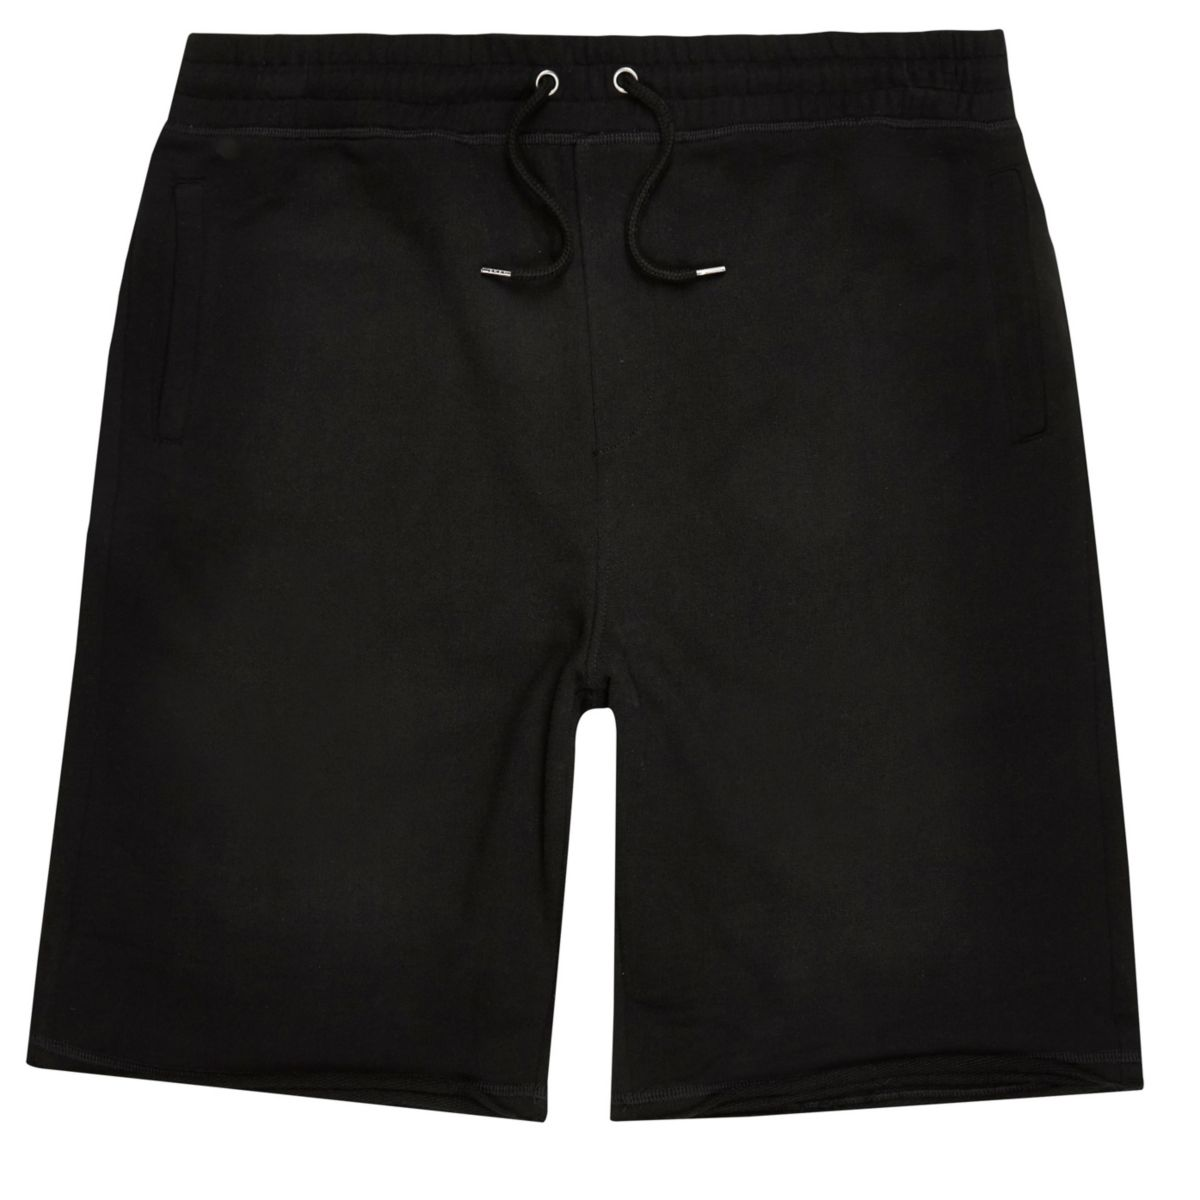 Black longer length jogger shorts